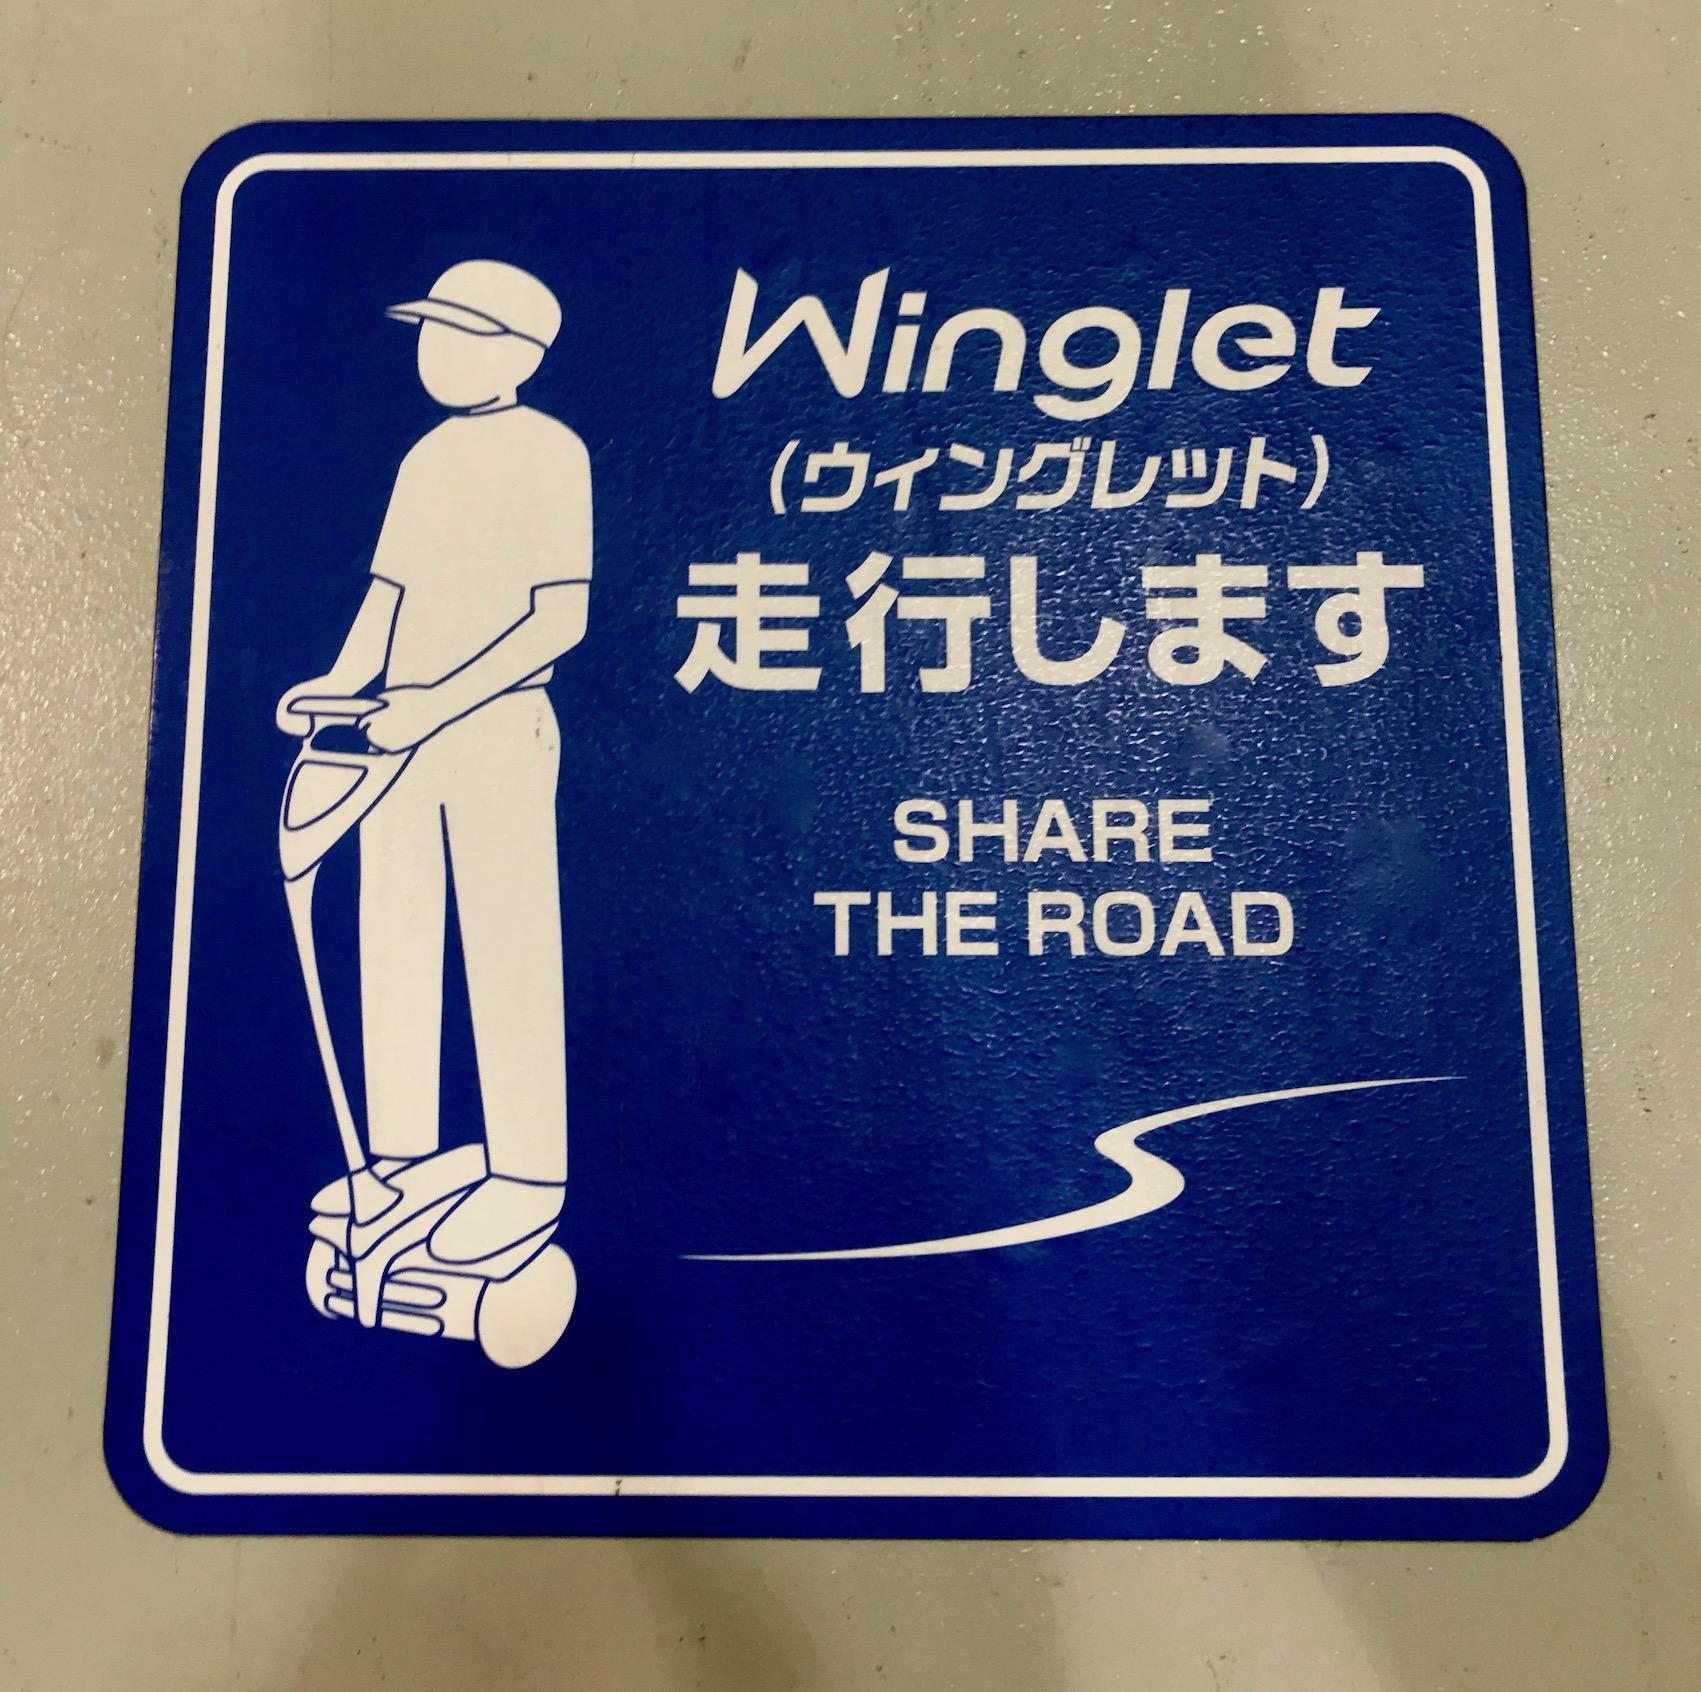 Winglet Share The Road Megaweb Toyota City Showcase Tokyo